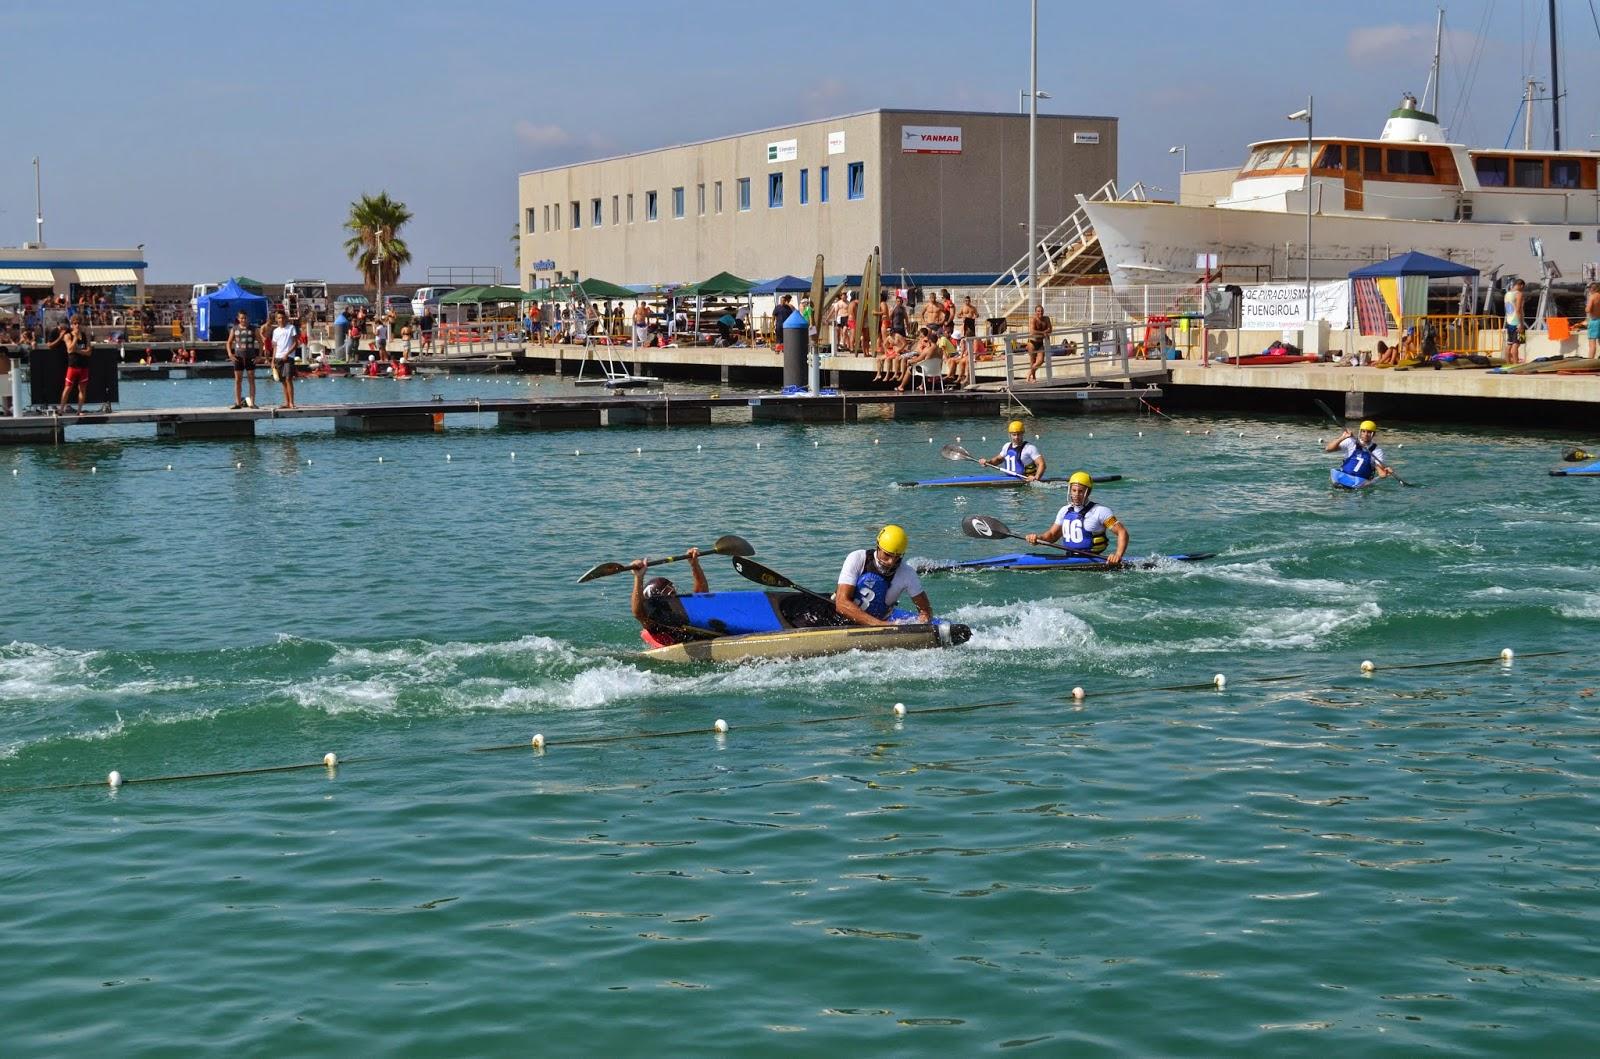 Club pirag isme silla el equipo de kayak polo club for Sillas para kayak